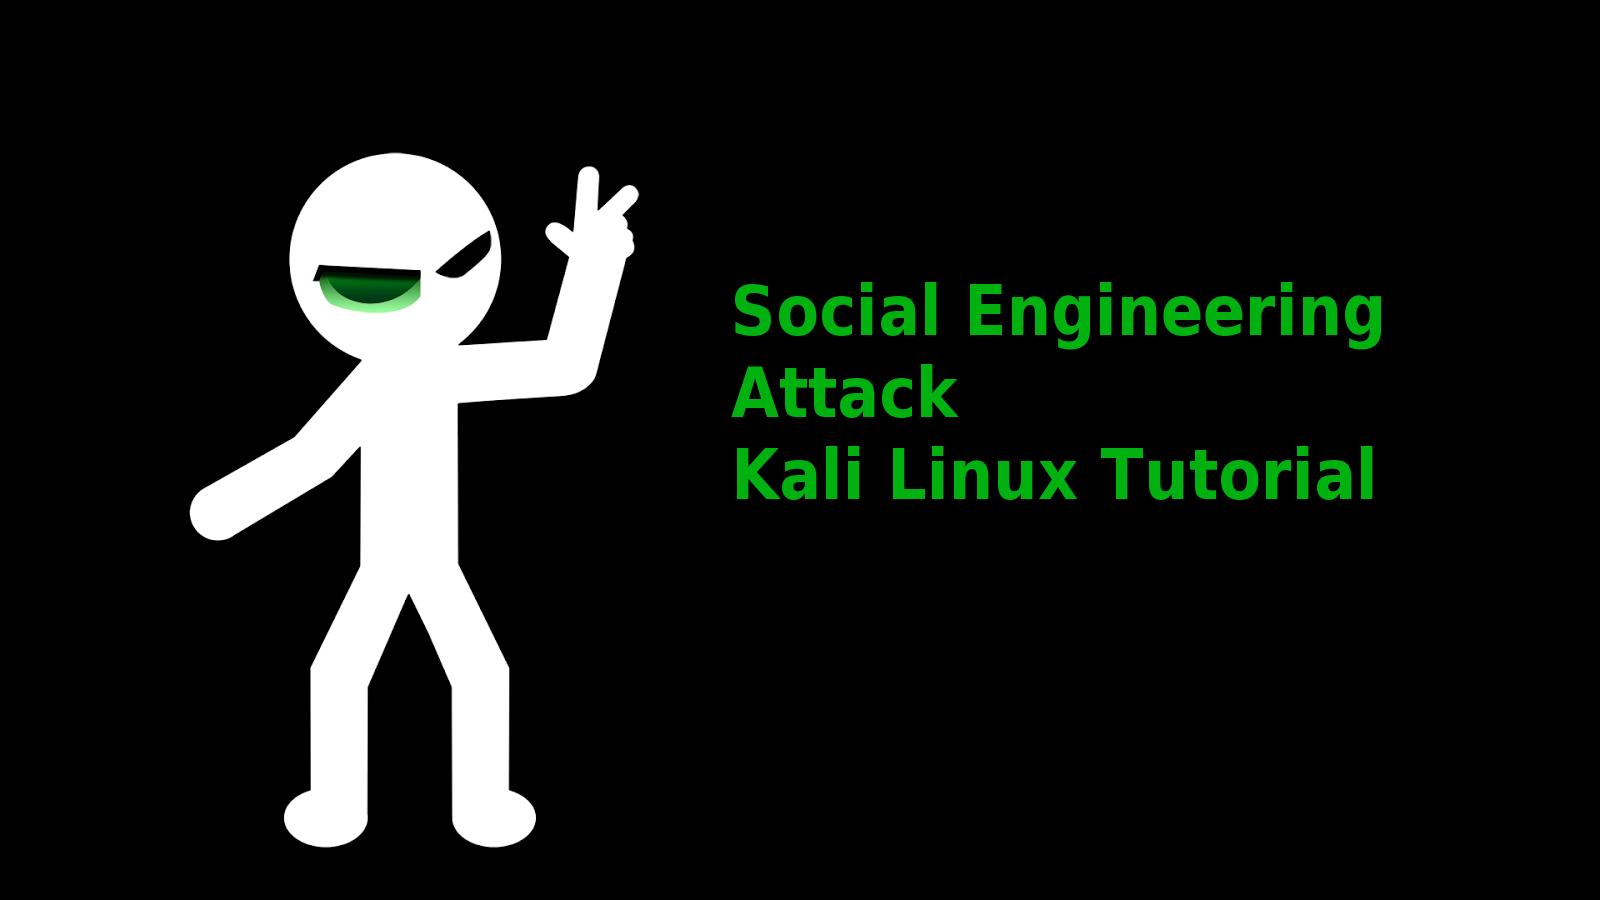 Complete kali linux tutorial for ethical hacking (installing kali.